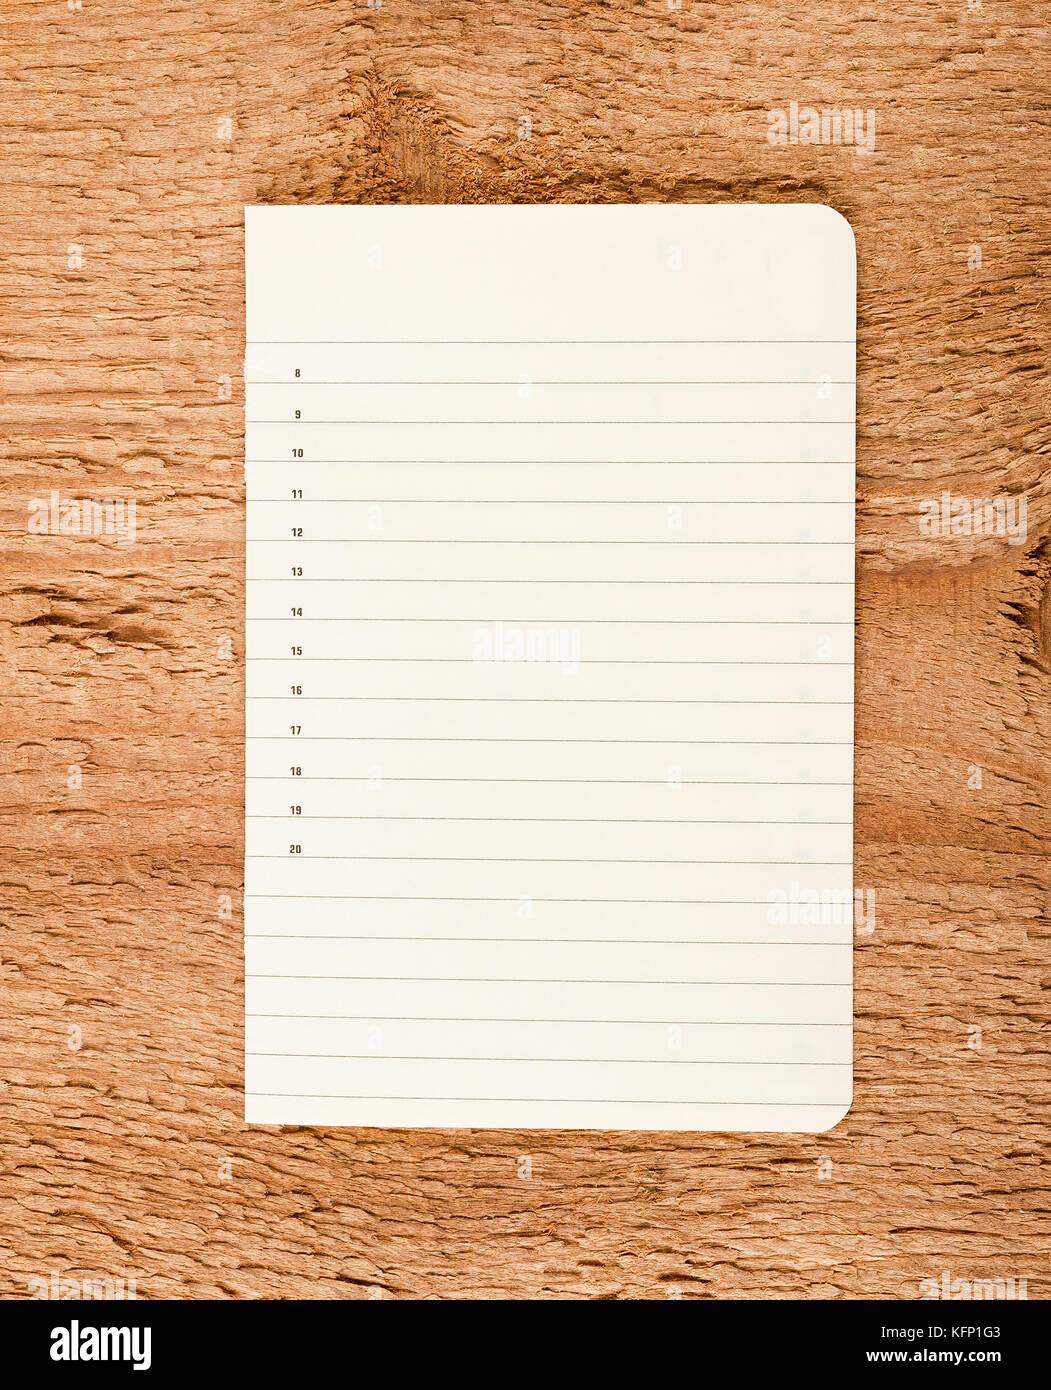 Paper sheet on wood background - Stock Image